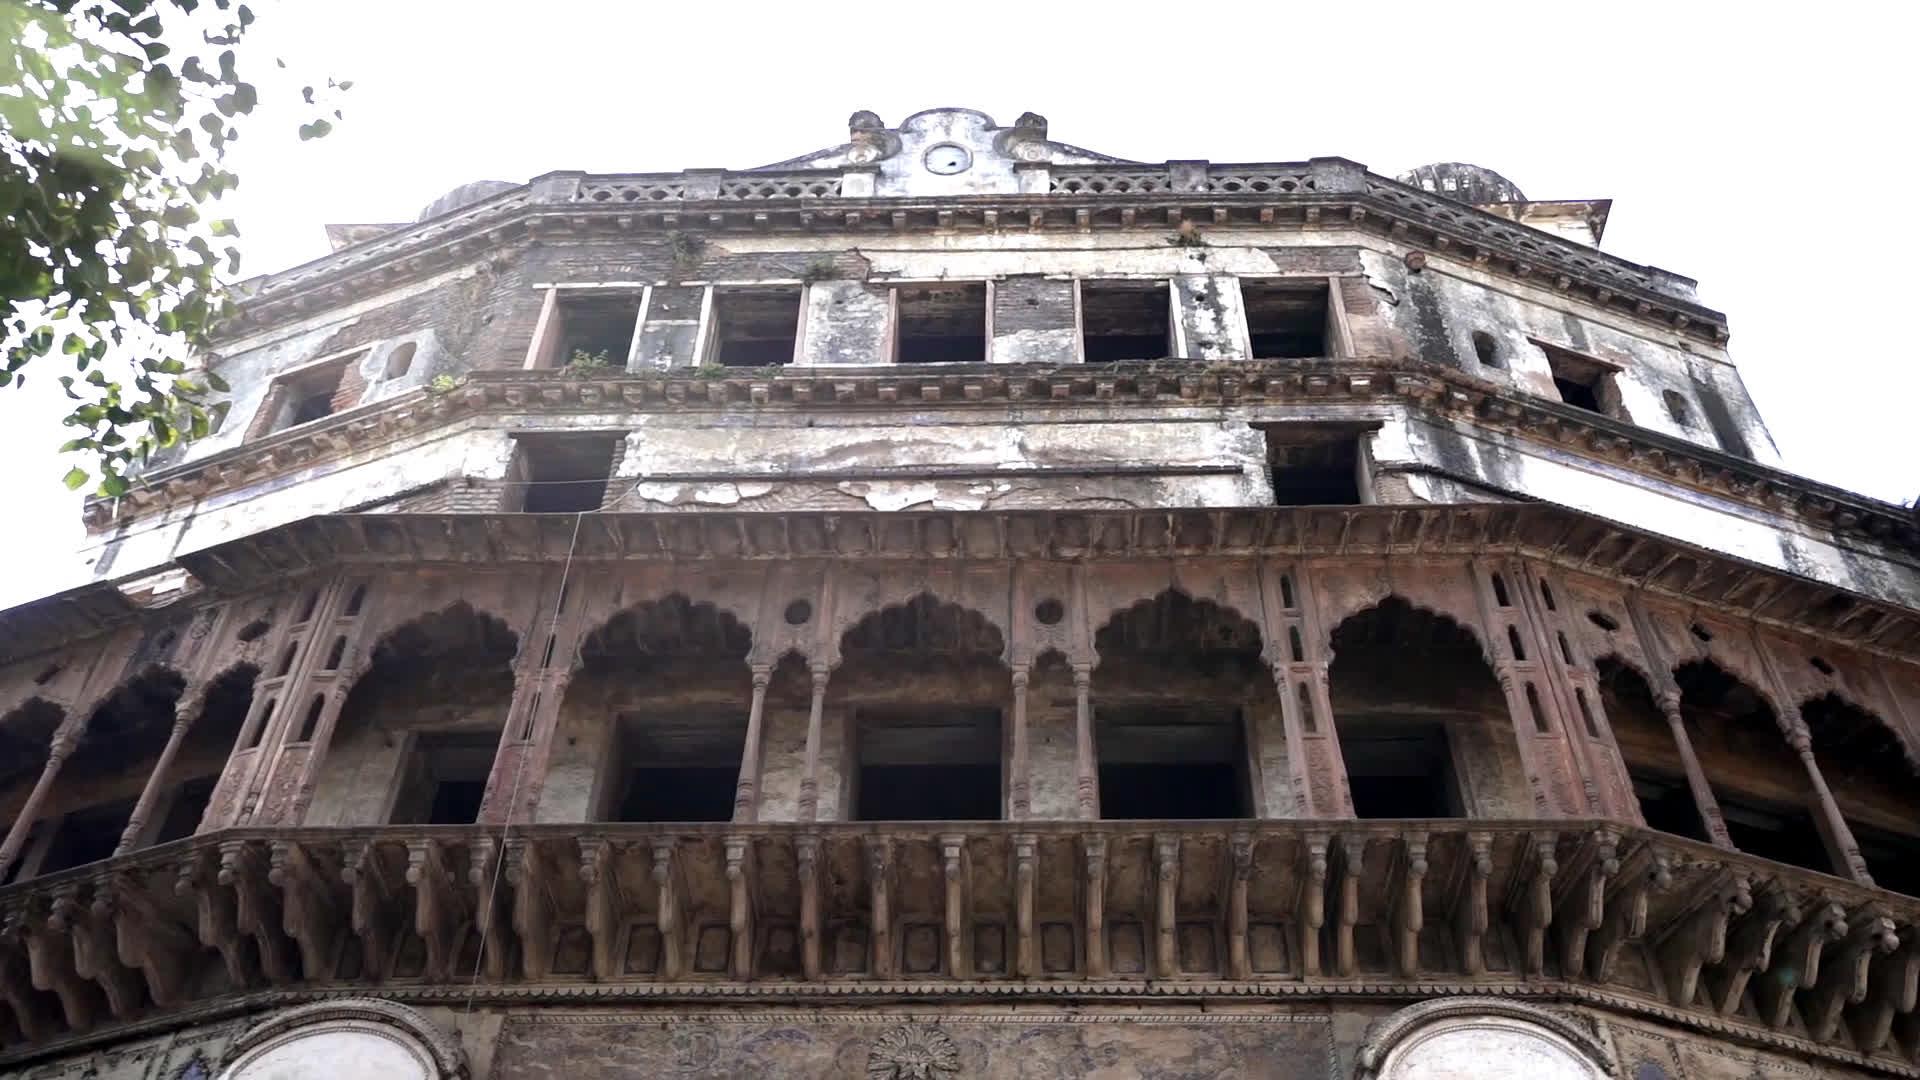 The Taj Mahal Palace of Bhopal